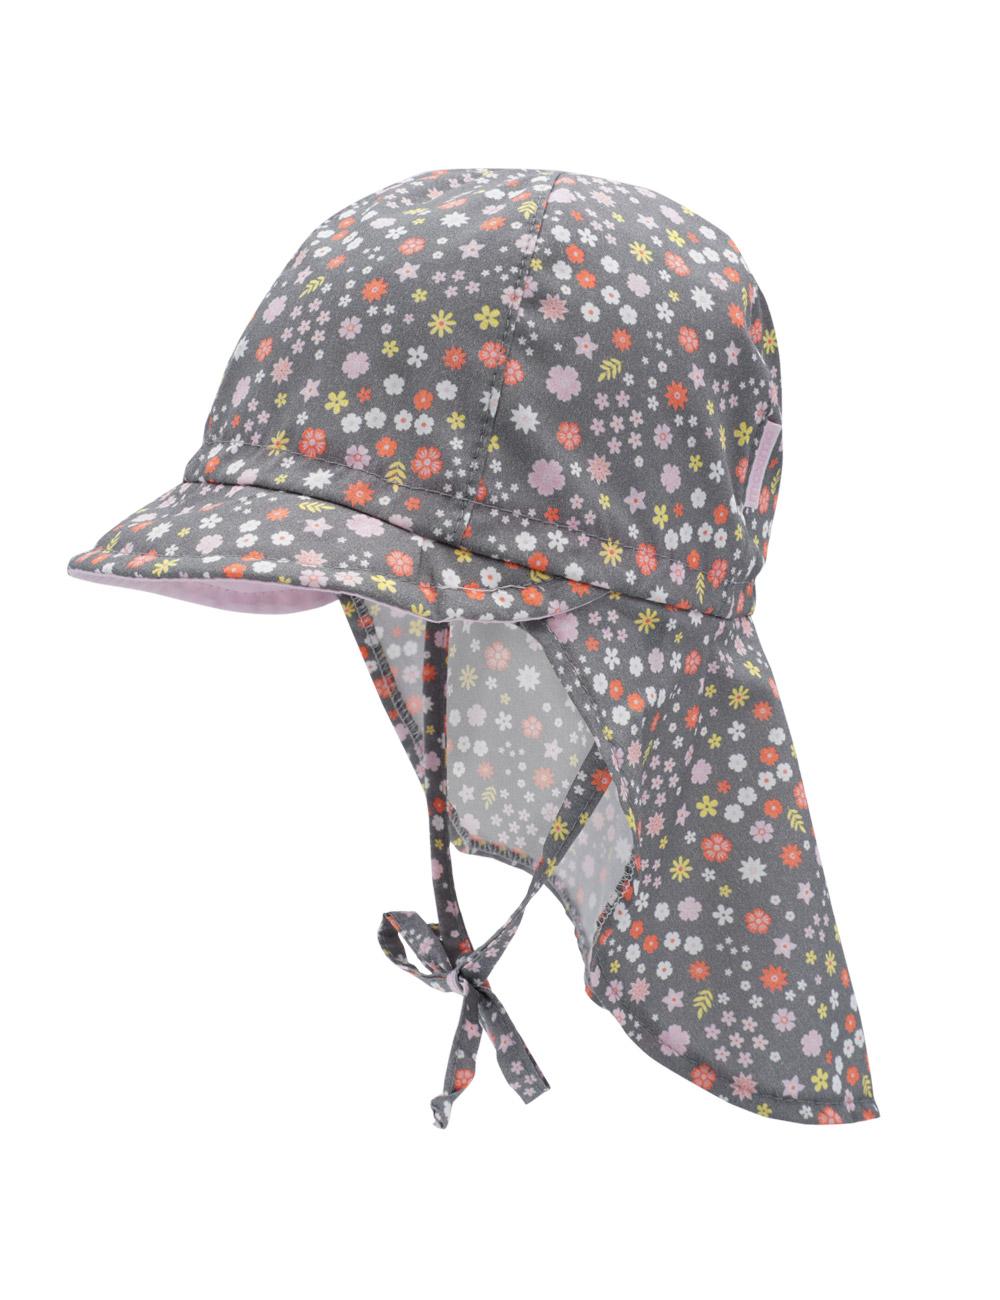 GIRL-Schildmütze 47 Maximo. Farbe: holzkohle-rosa-blümchen, Größe: 47